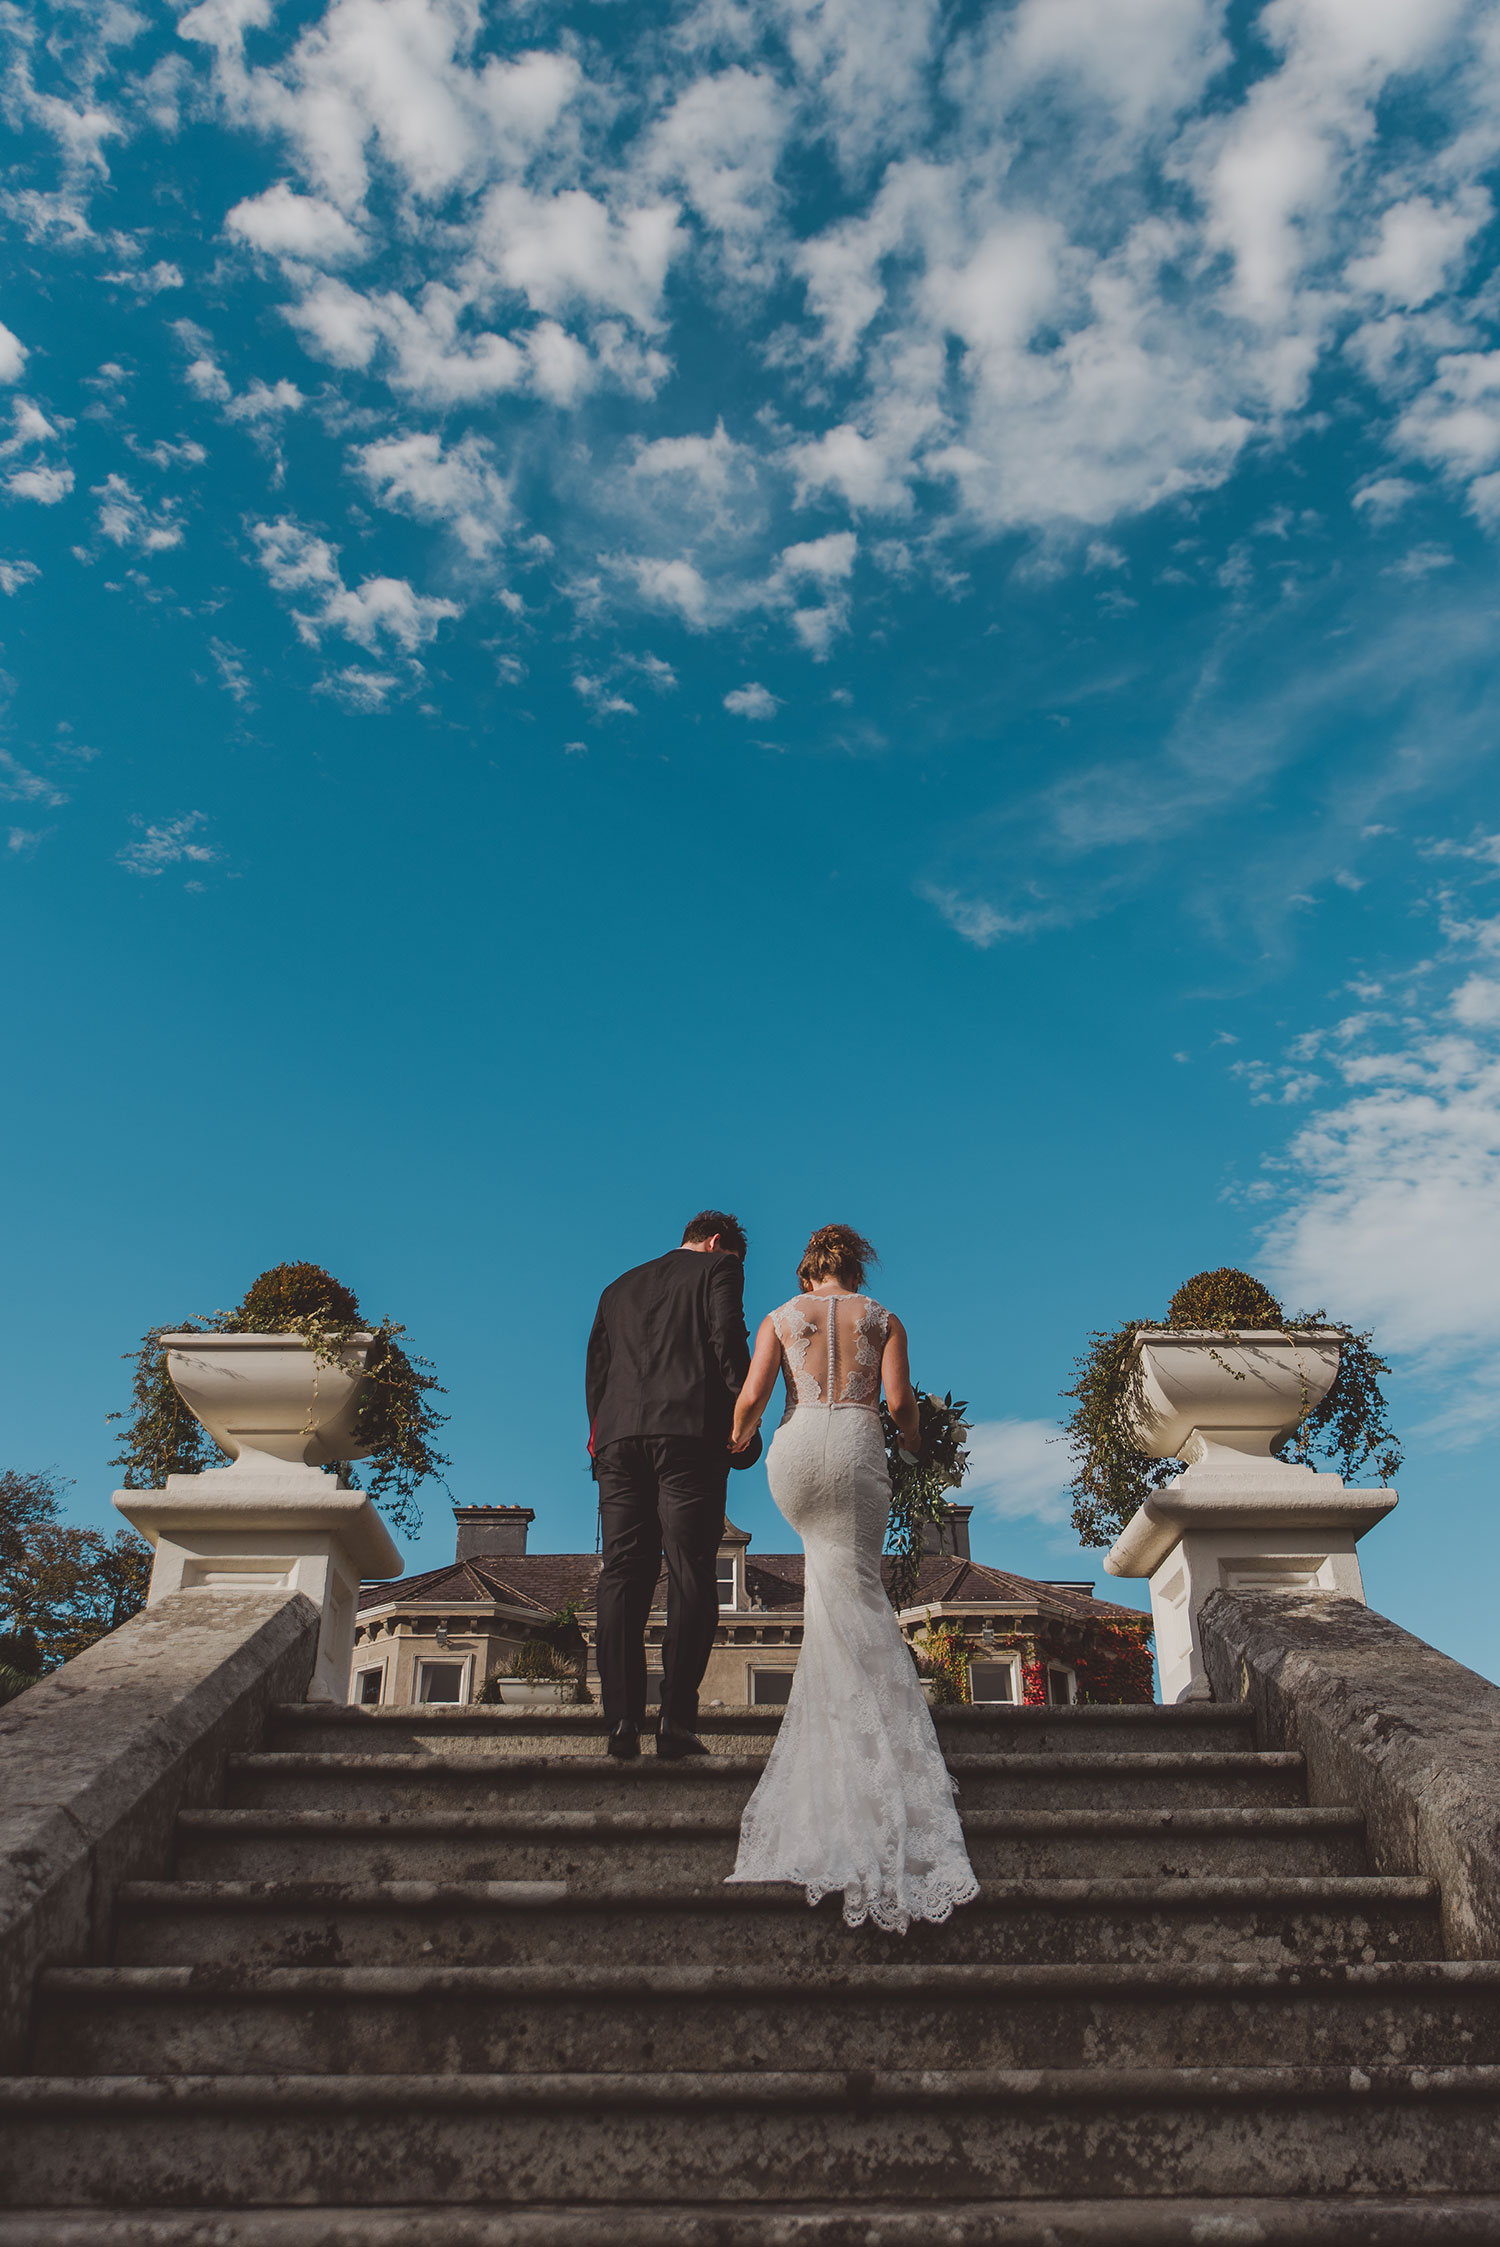 tinakilly-house-wedding-photographer096.jpg